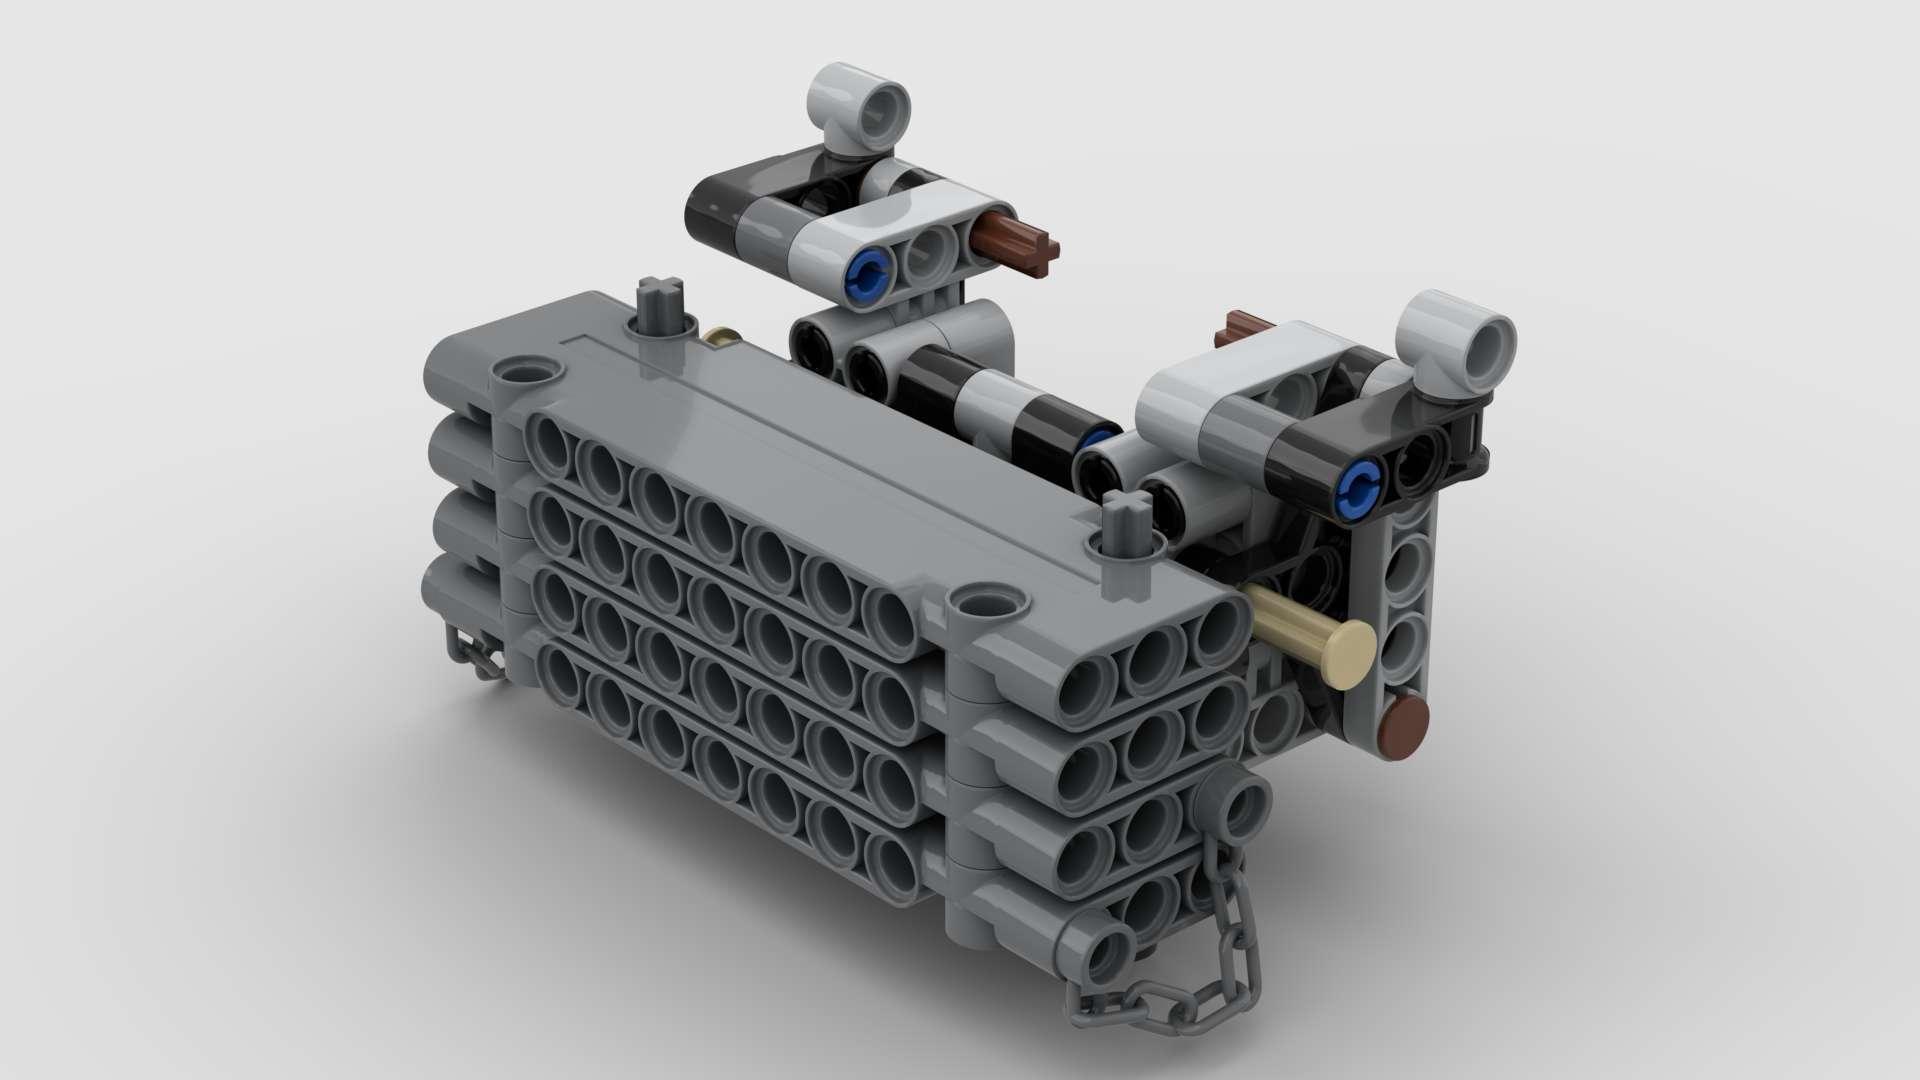 00 42054 Rc Original Xerion 5000 VC 7 Motoren MOD06